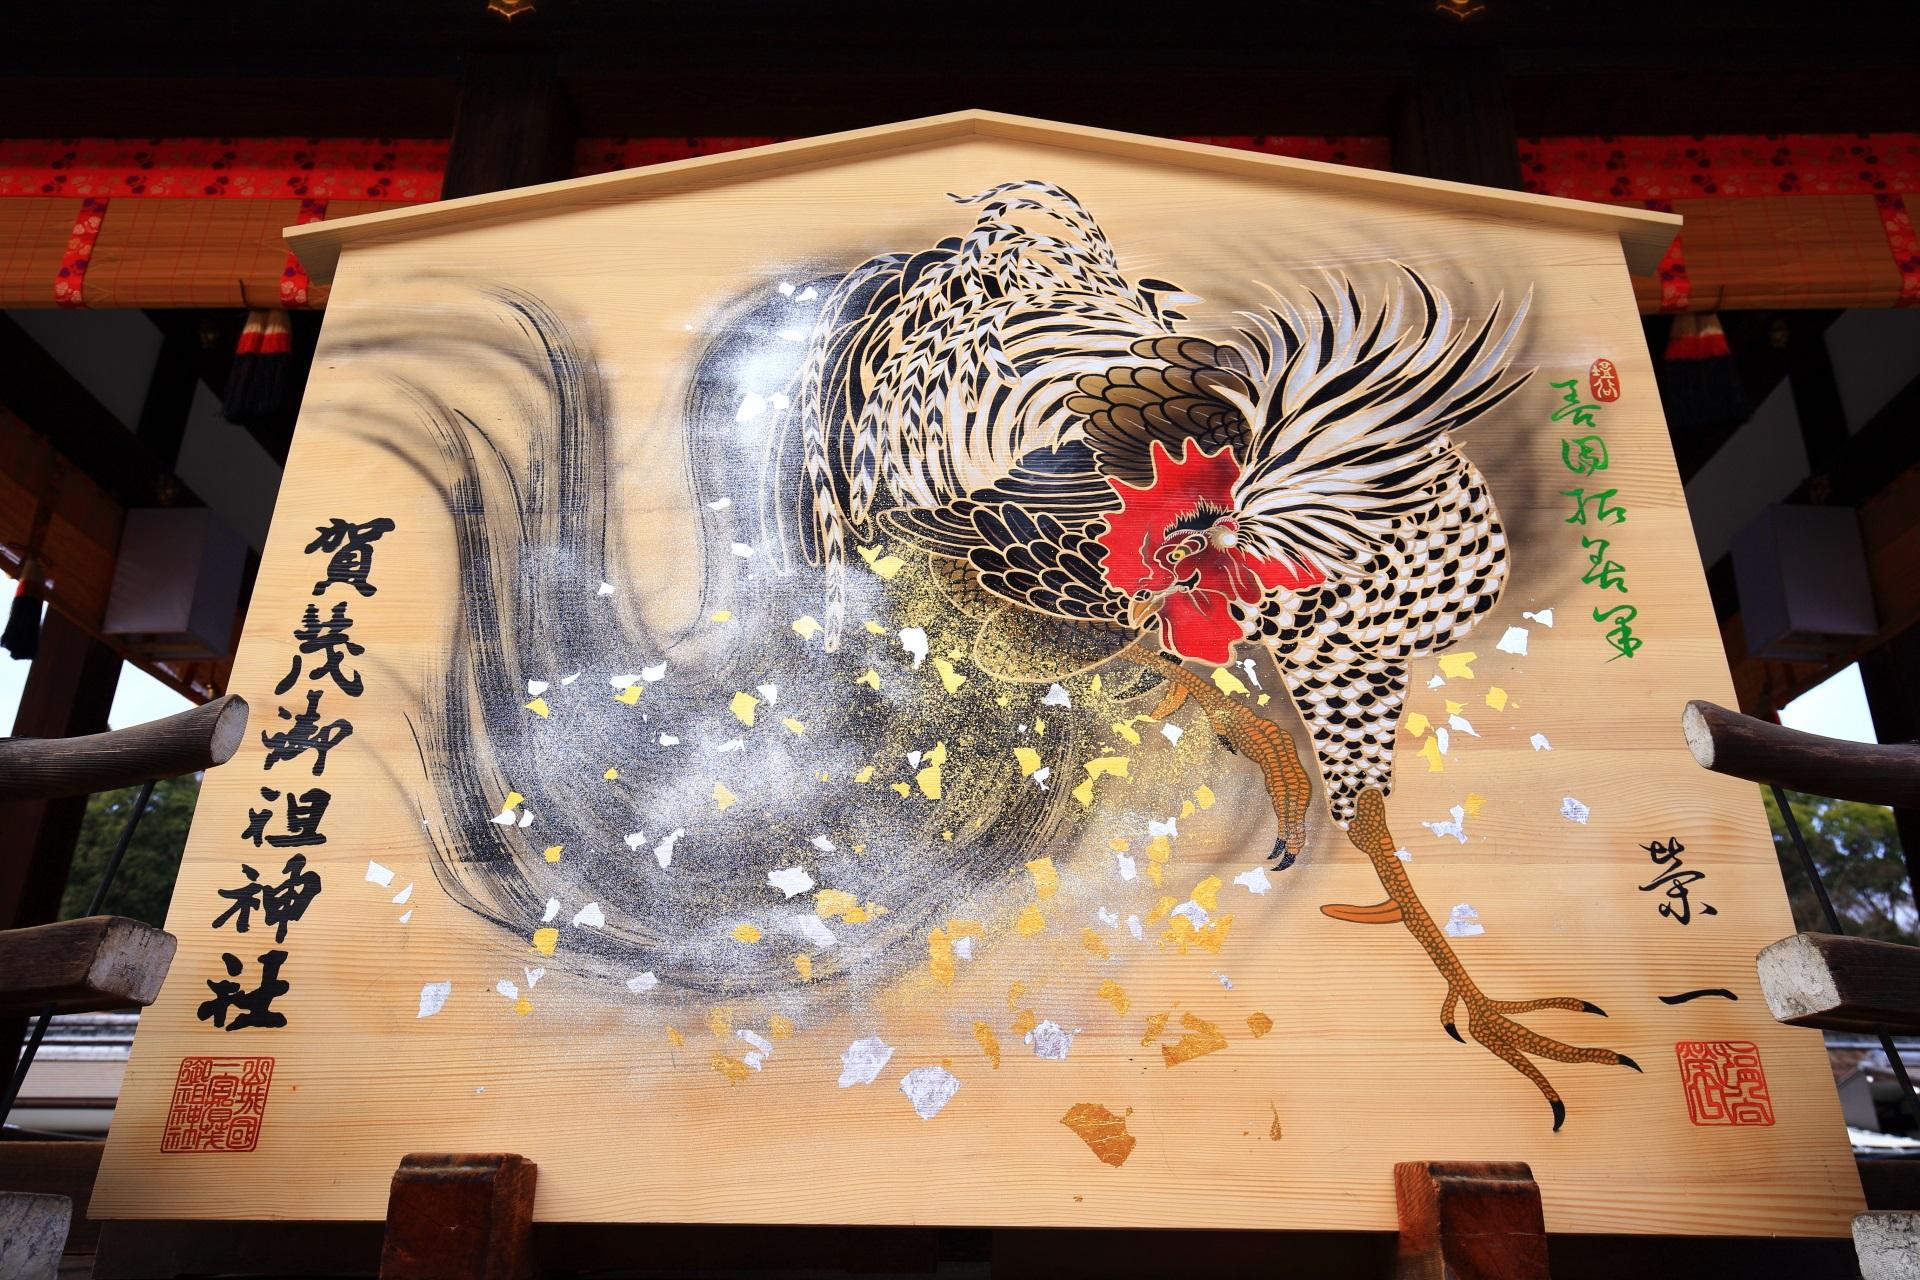 大絵馬 酉 下鴨神社の迫力の干支の大絵馬 恭賀新年